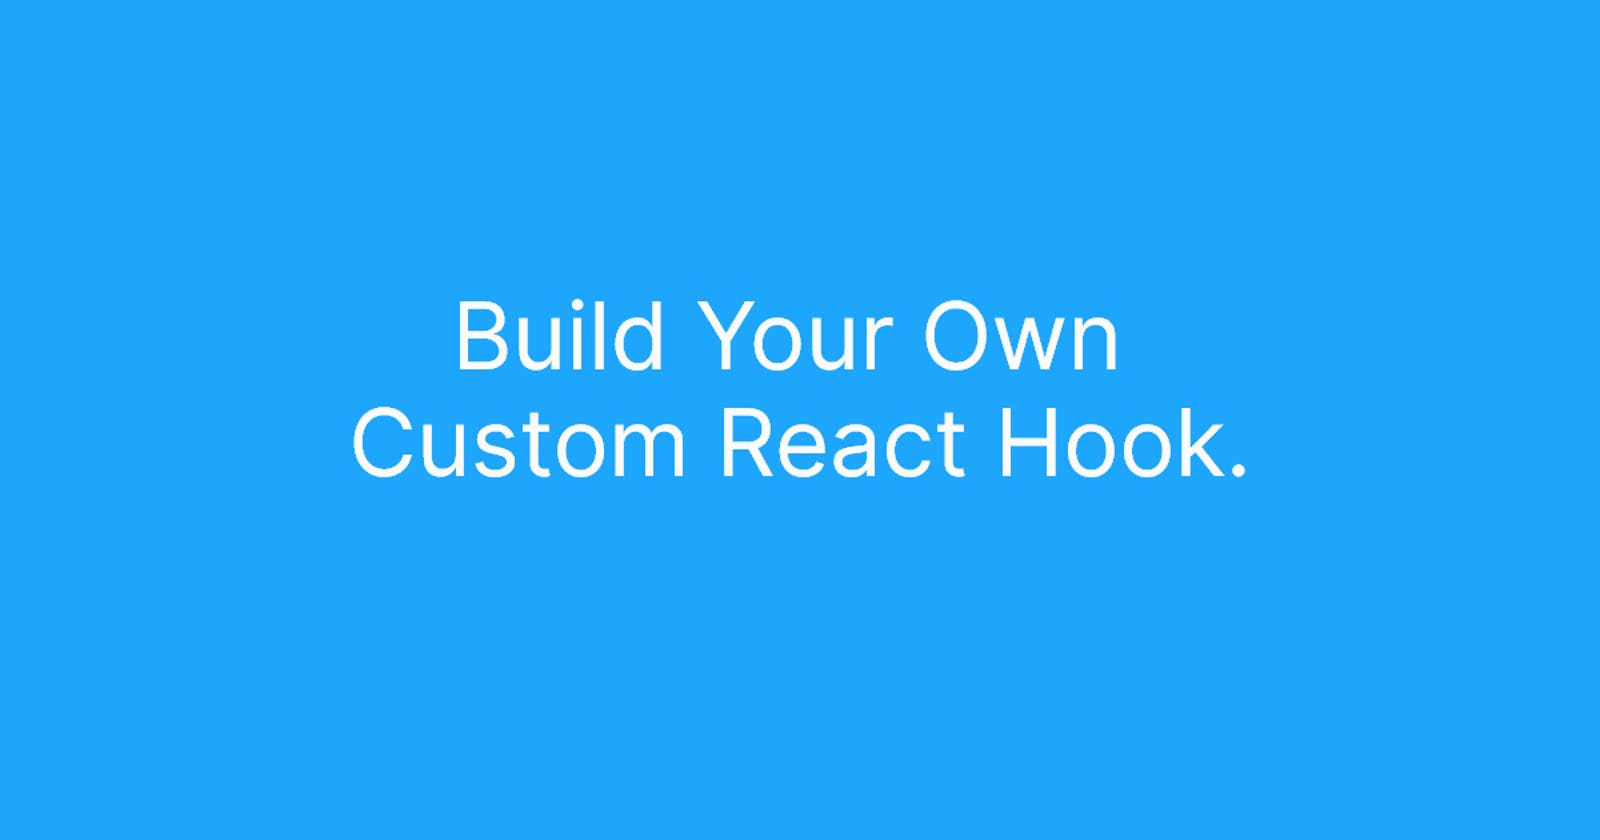 Build Your Own Custom React Hook.